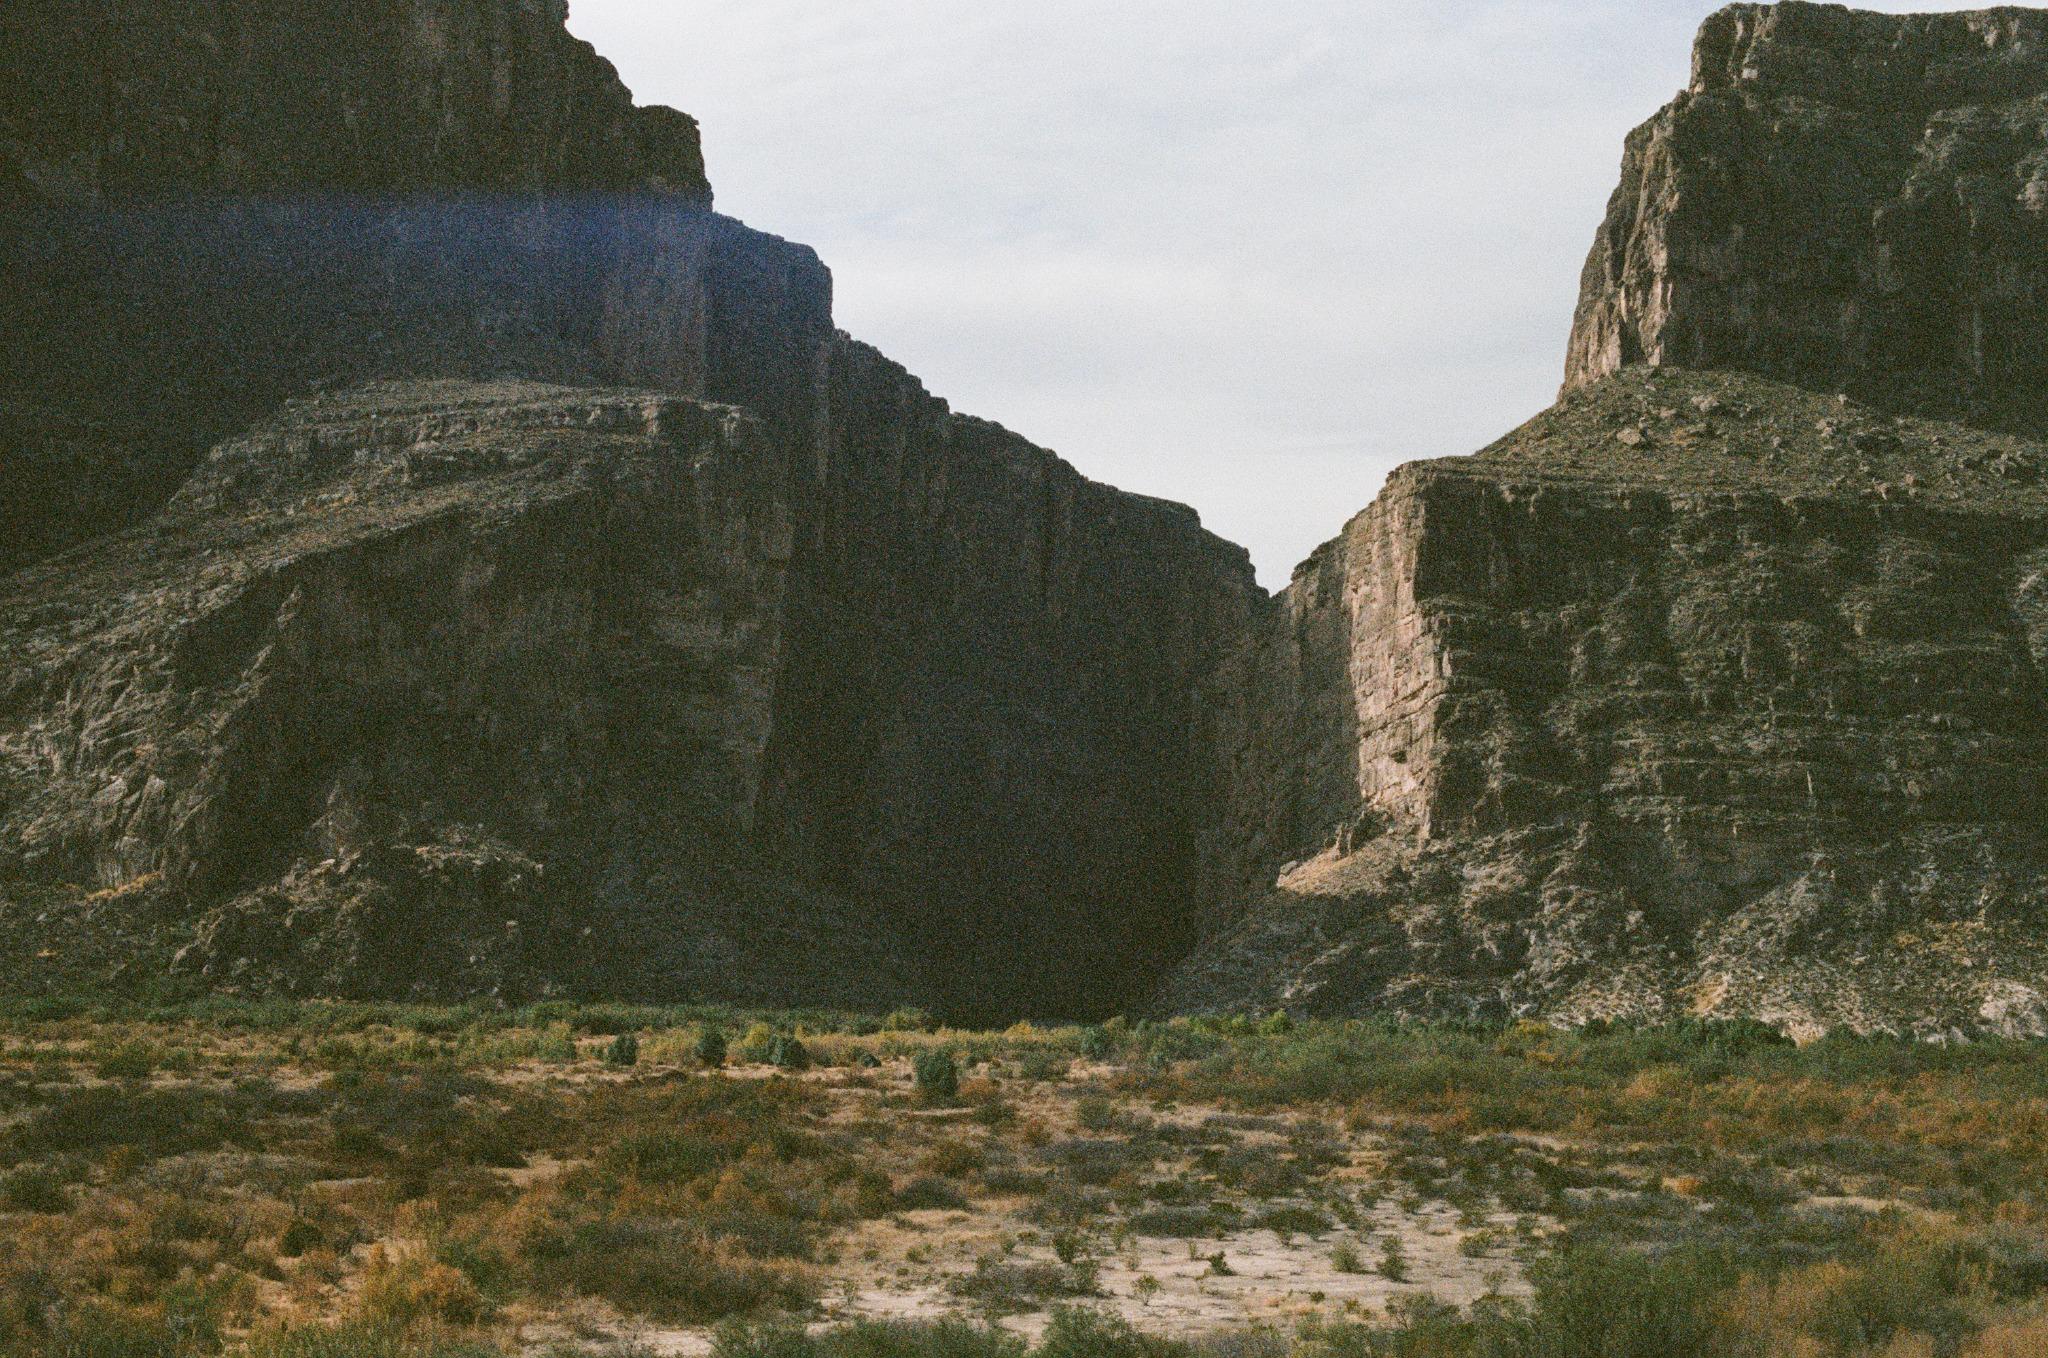 Santa Elena Canyon, Big Bend National Park, 2017